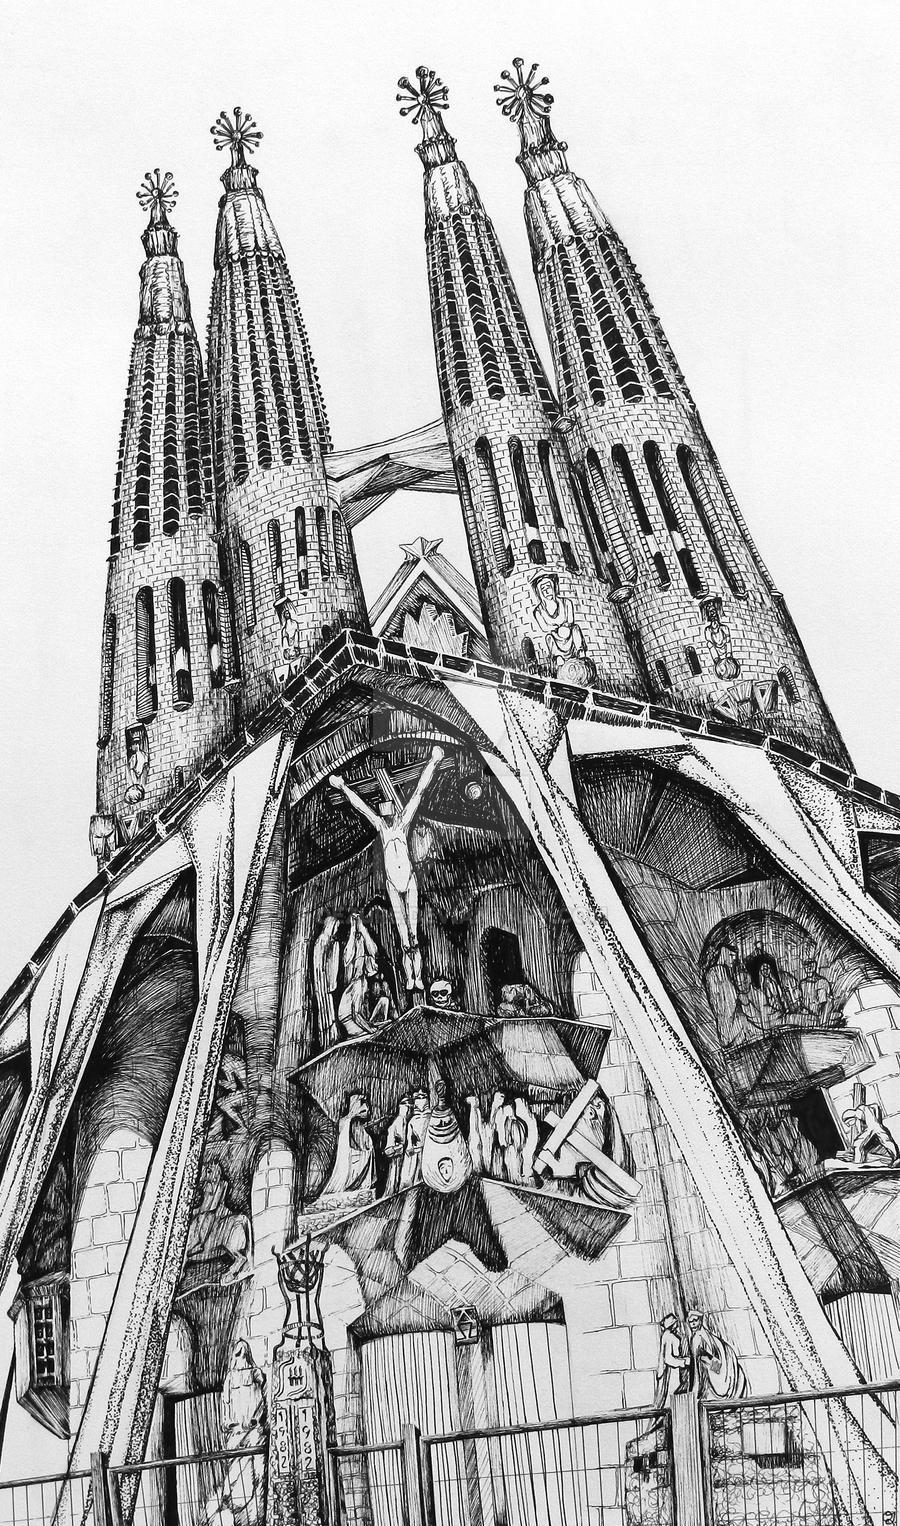 La sagrada familia by antoni gaudi by dezure on deviantart for Antoni gaudi sagrada familia architecture